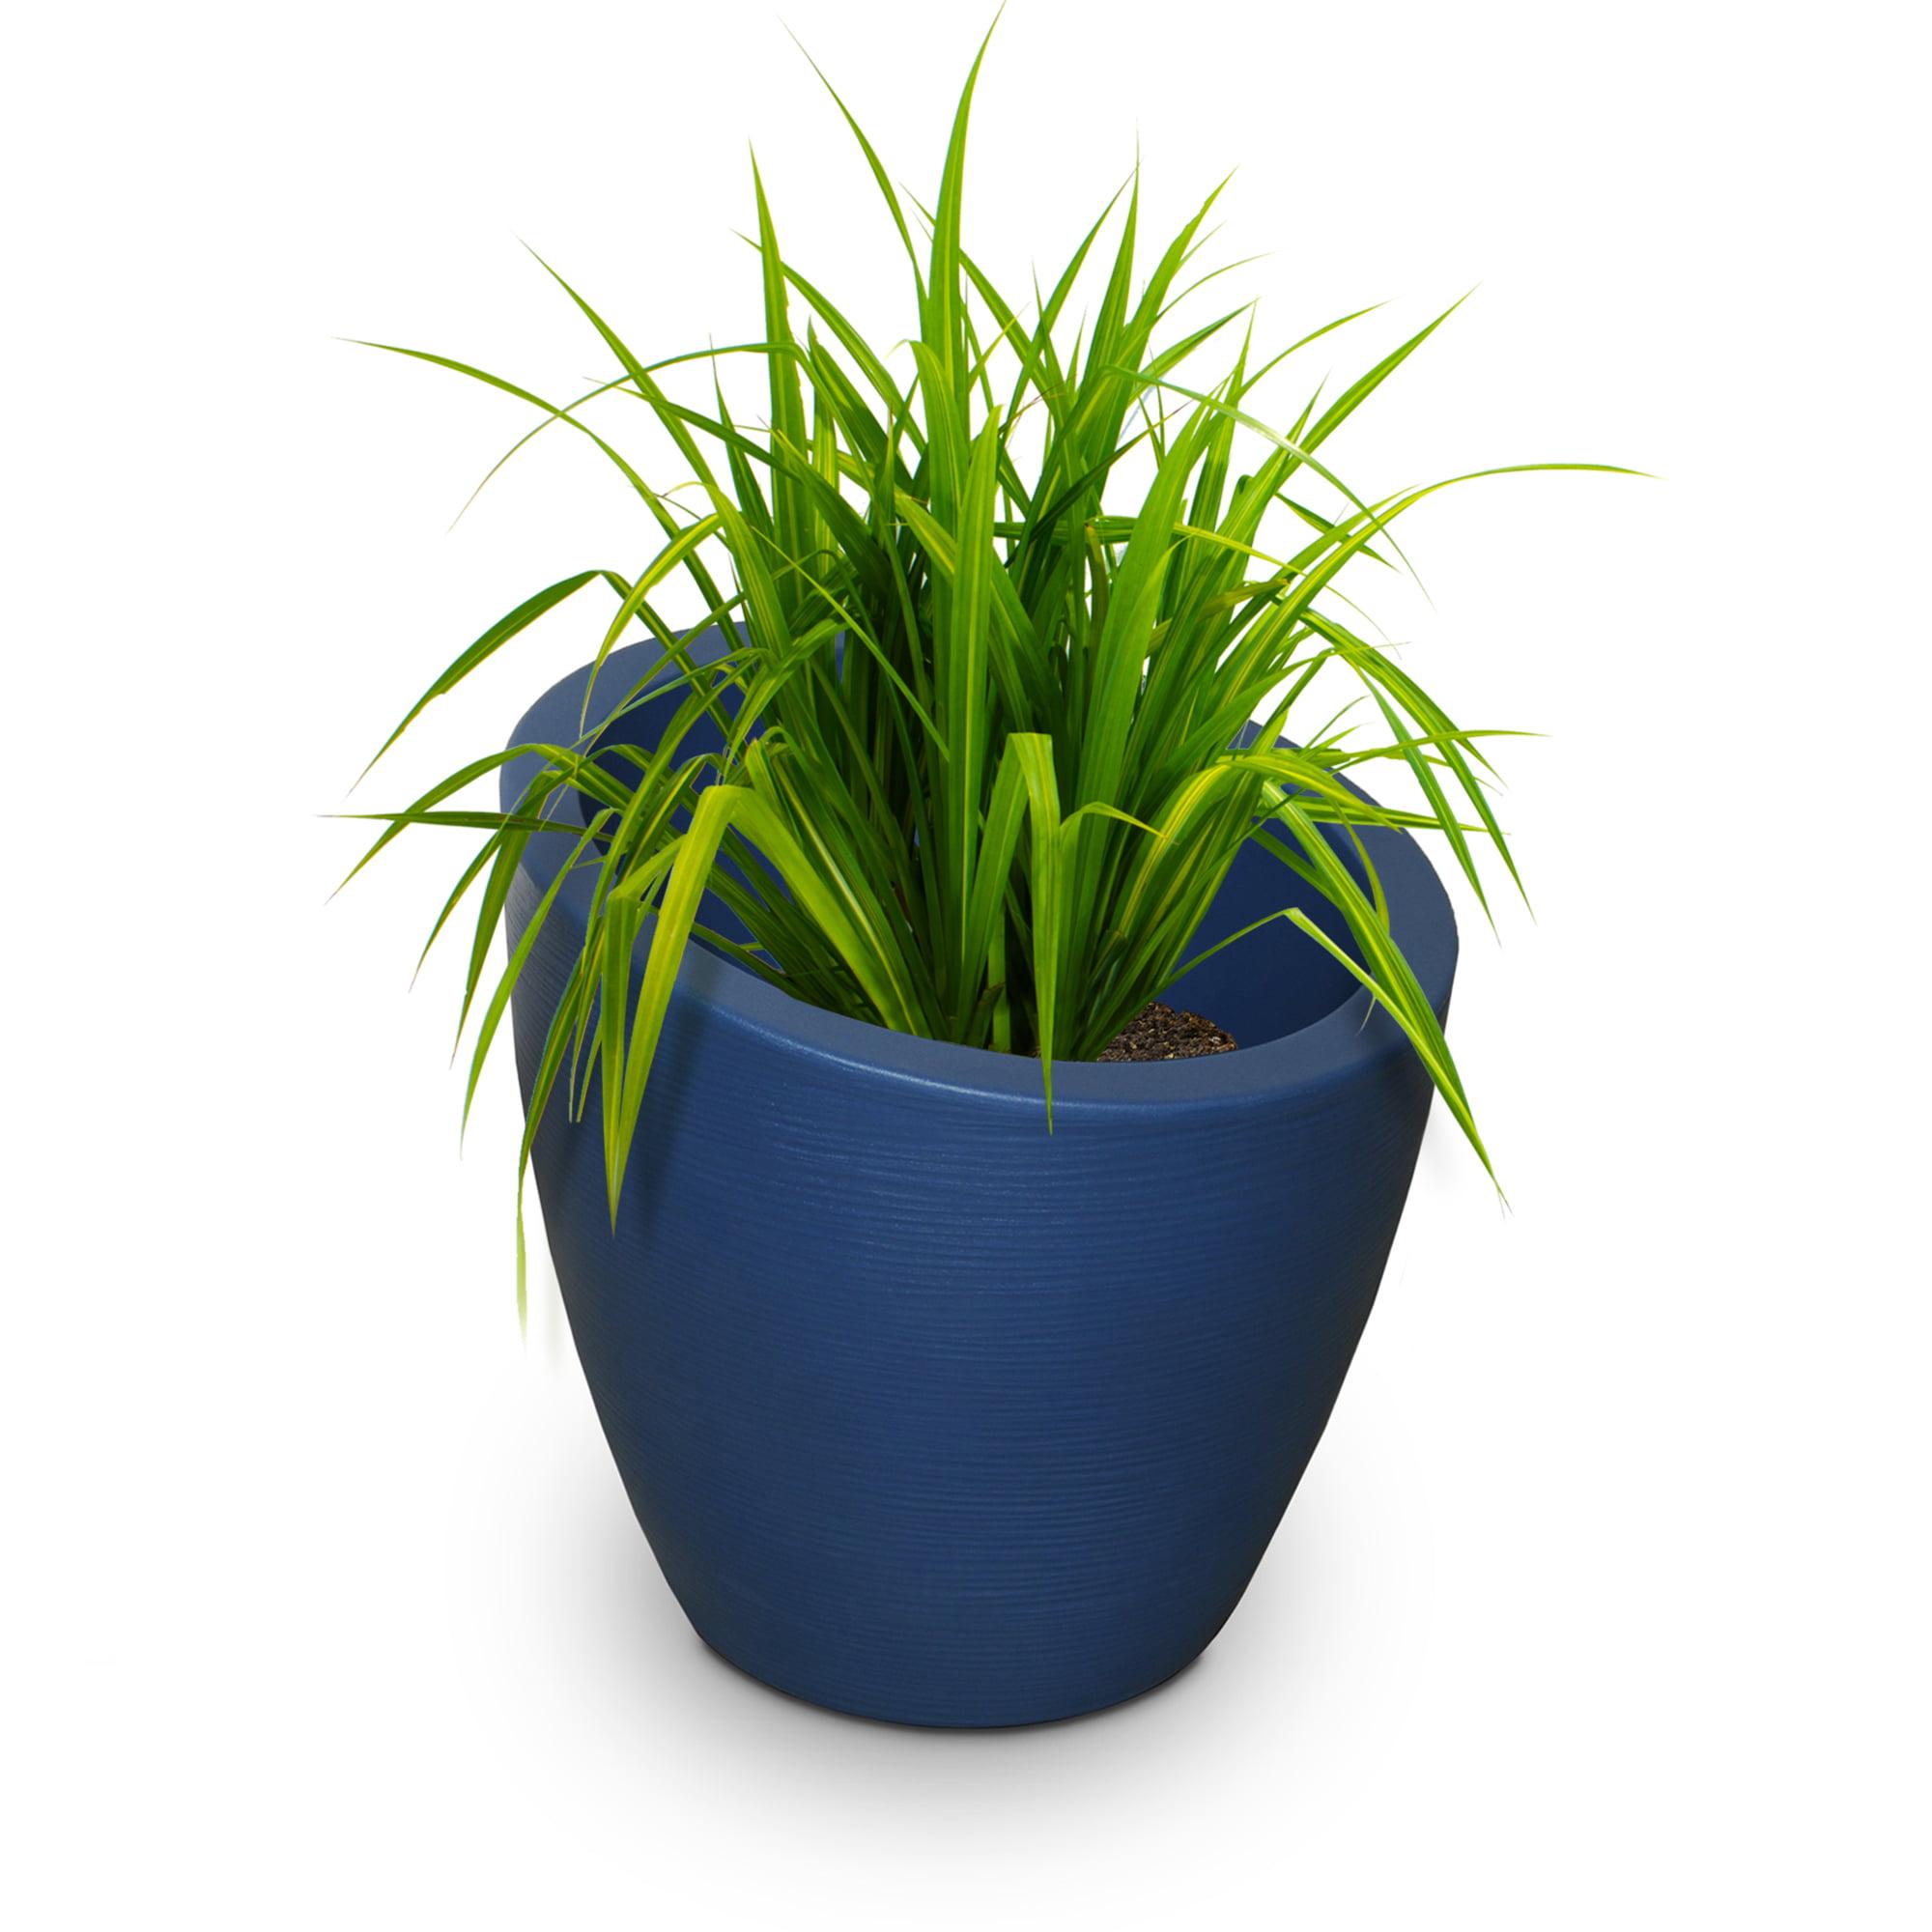 Modesto 20in Round Planter - Neptune Blue